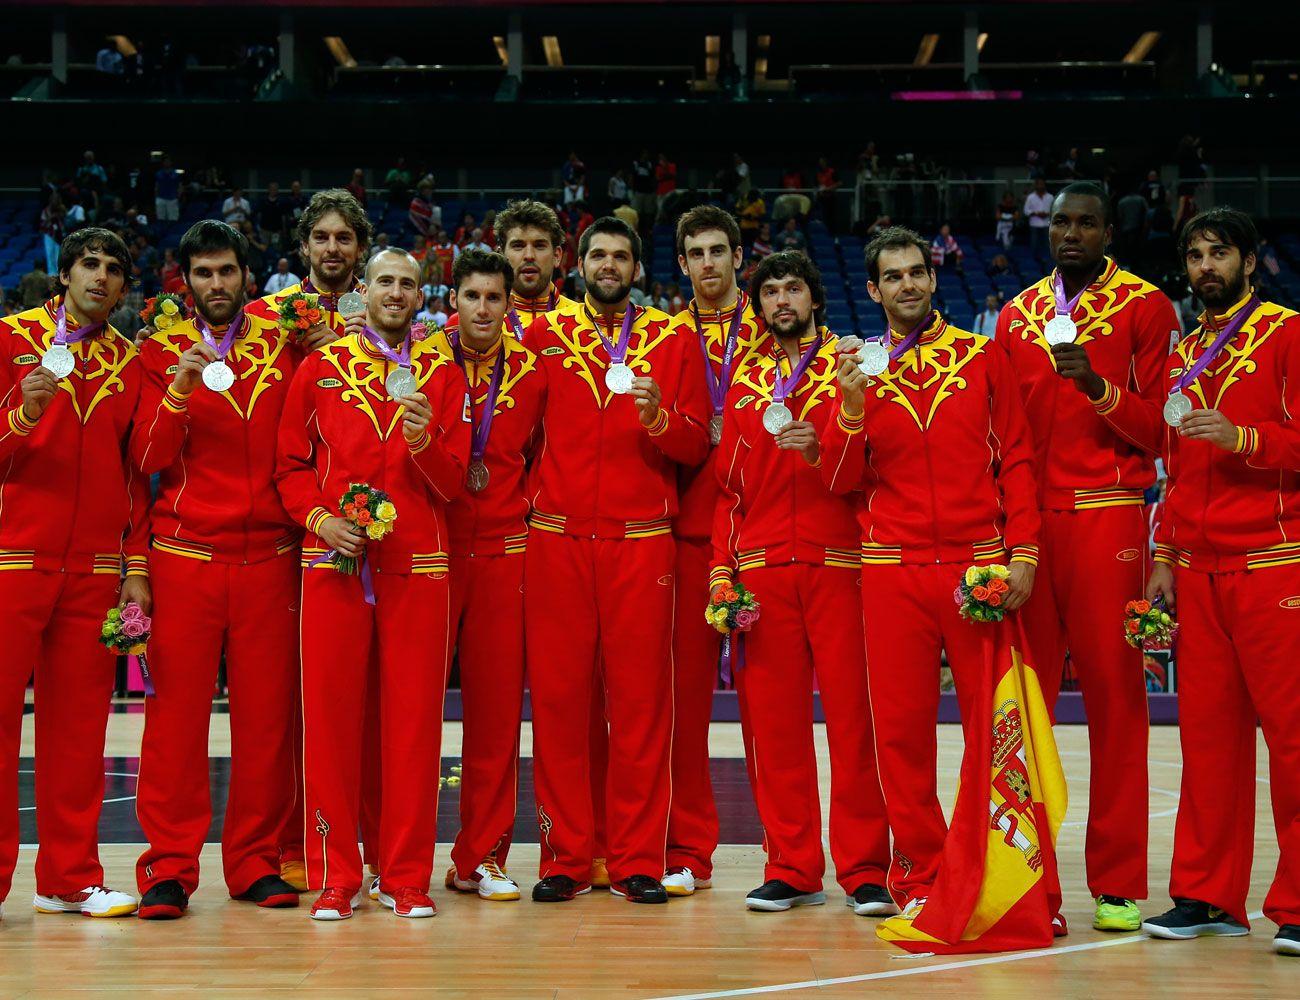 Baloncesto, una plata de oro Baloncesto, Deporte español